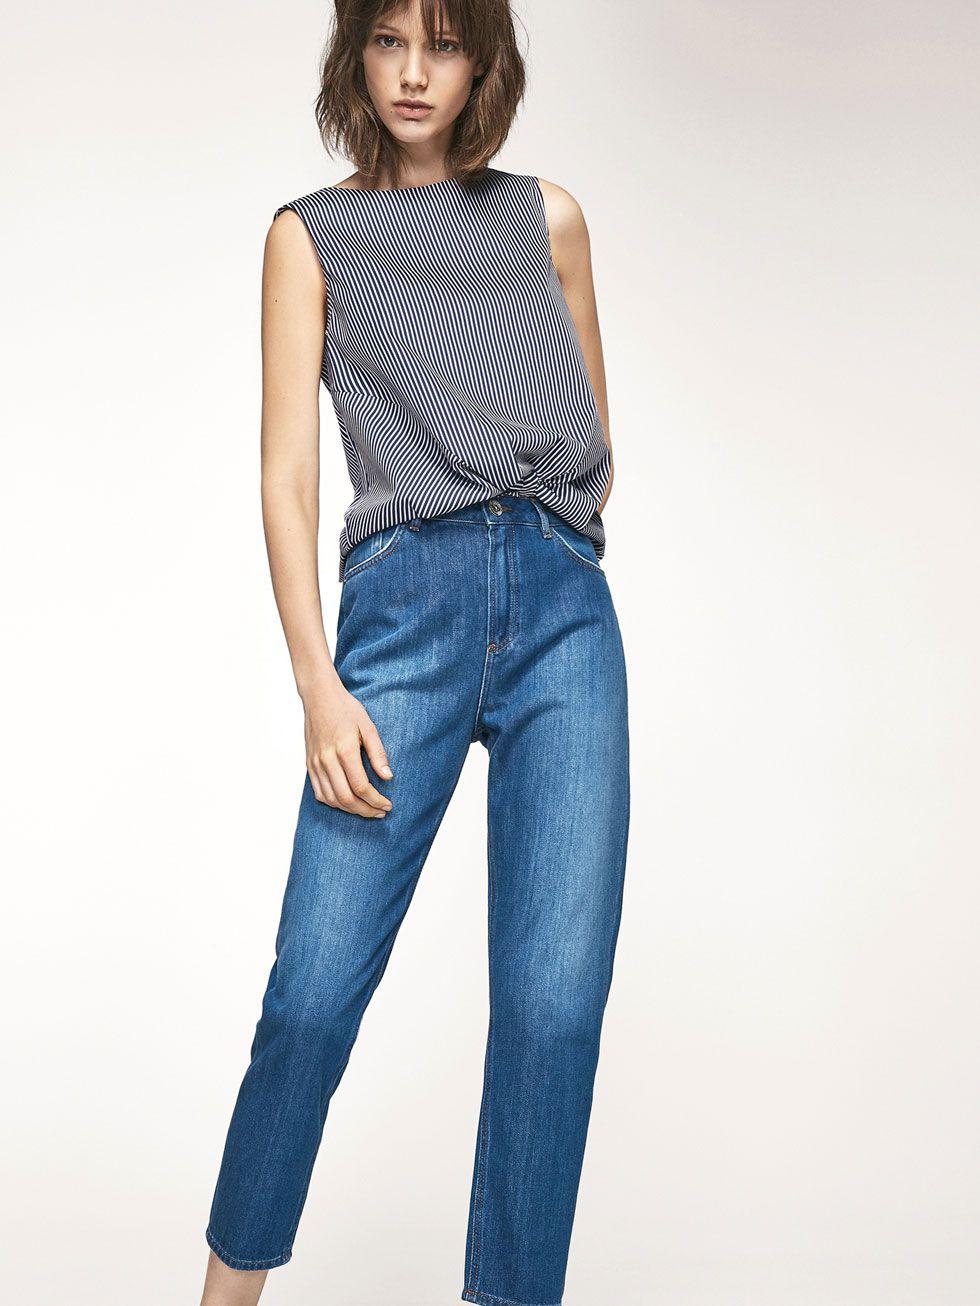 mom fit jeans de women collection the power list da. Black Bedroom Furniture Sets. Home Design Ideas